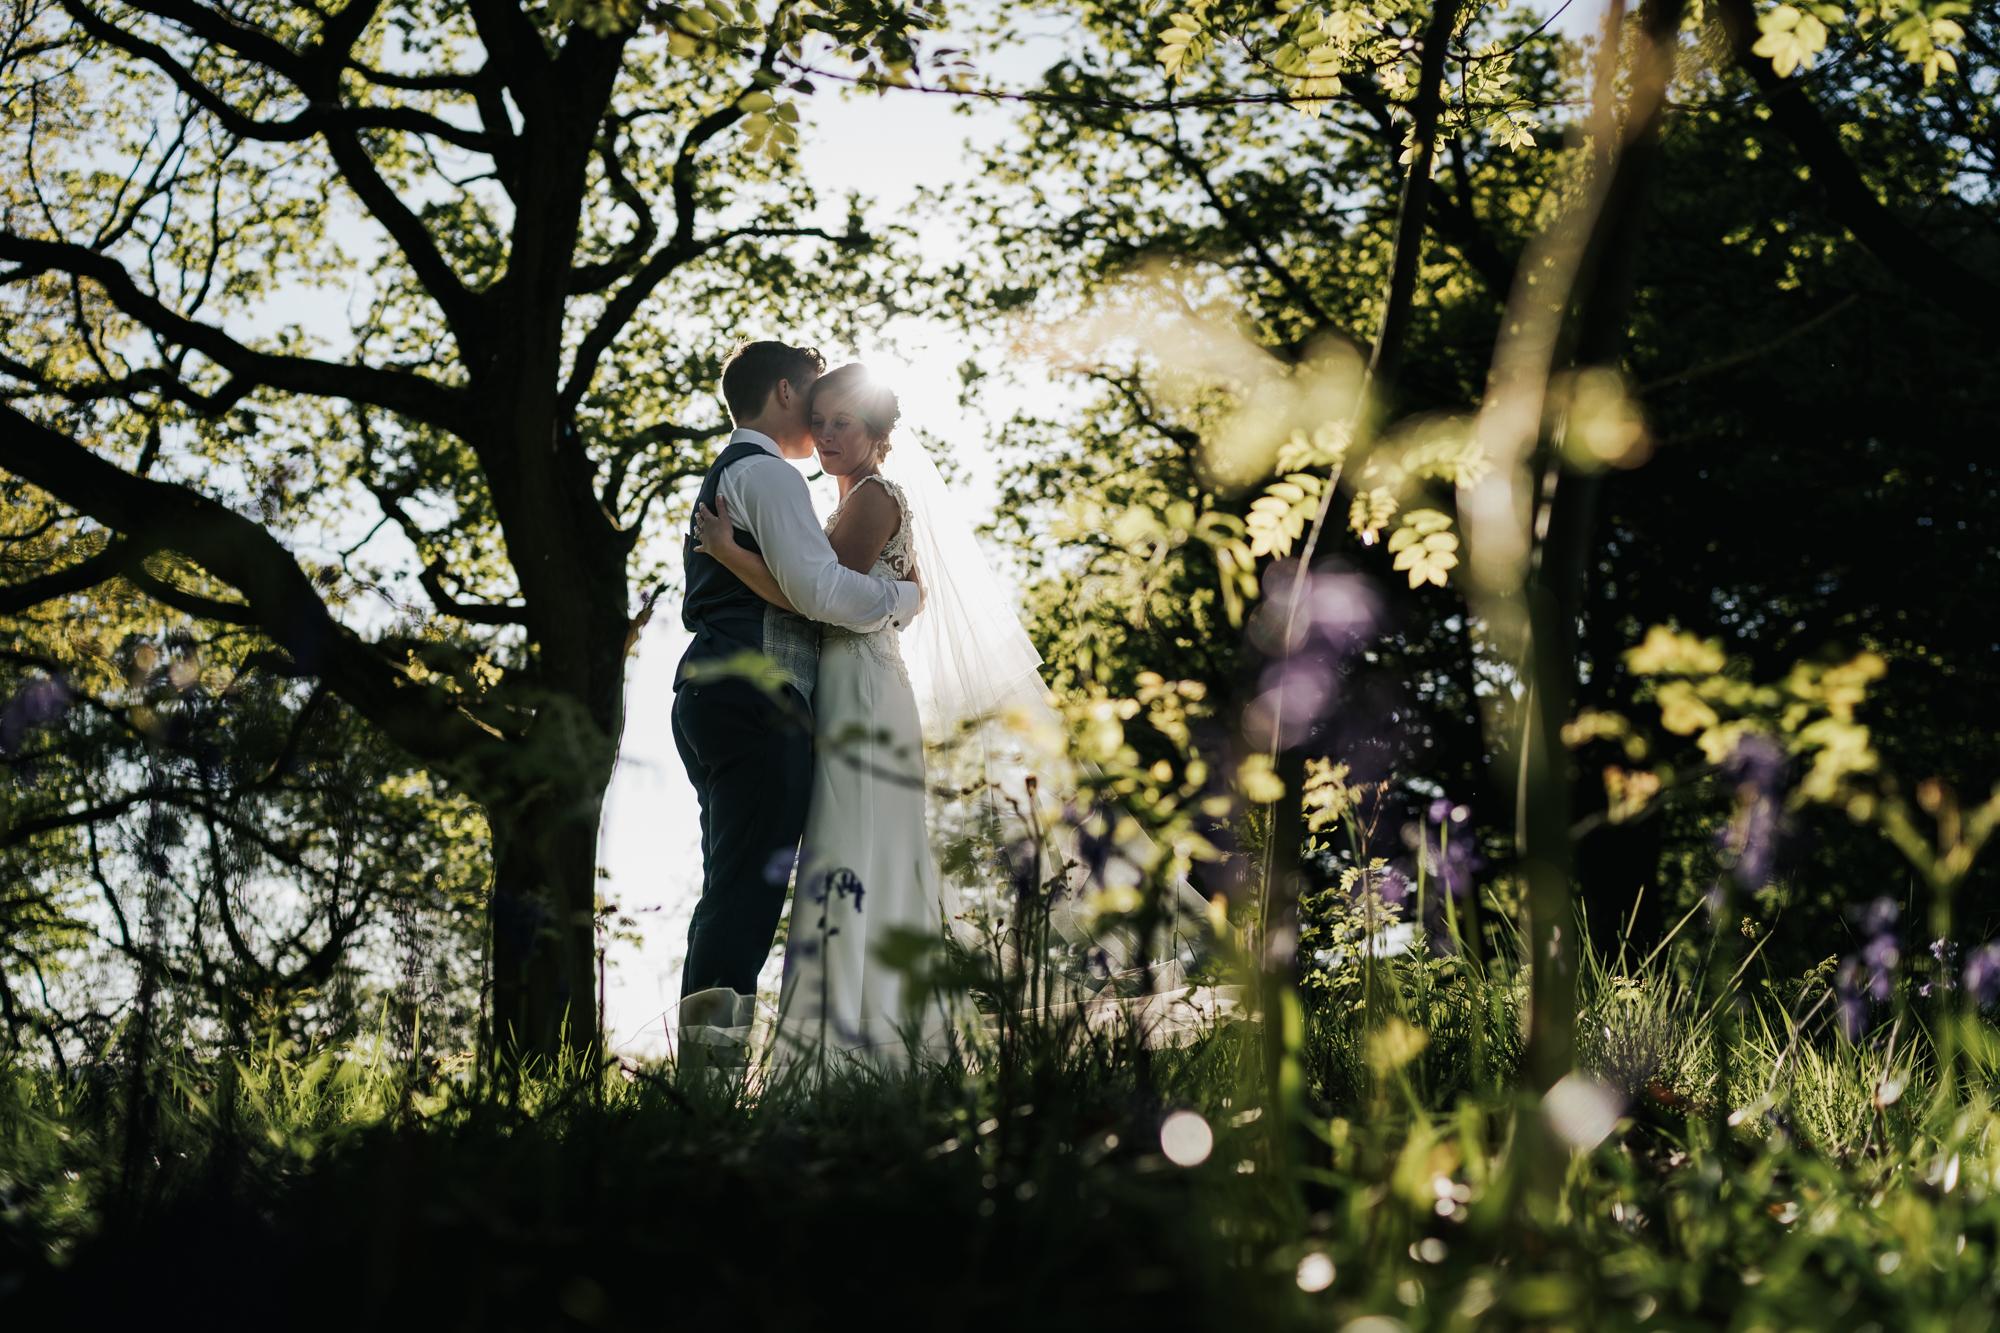 Rivington Hall Barn Wedding Photography lancashire wedding photographer (37 of 45).jpg